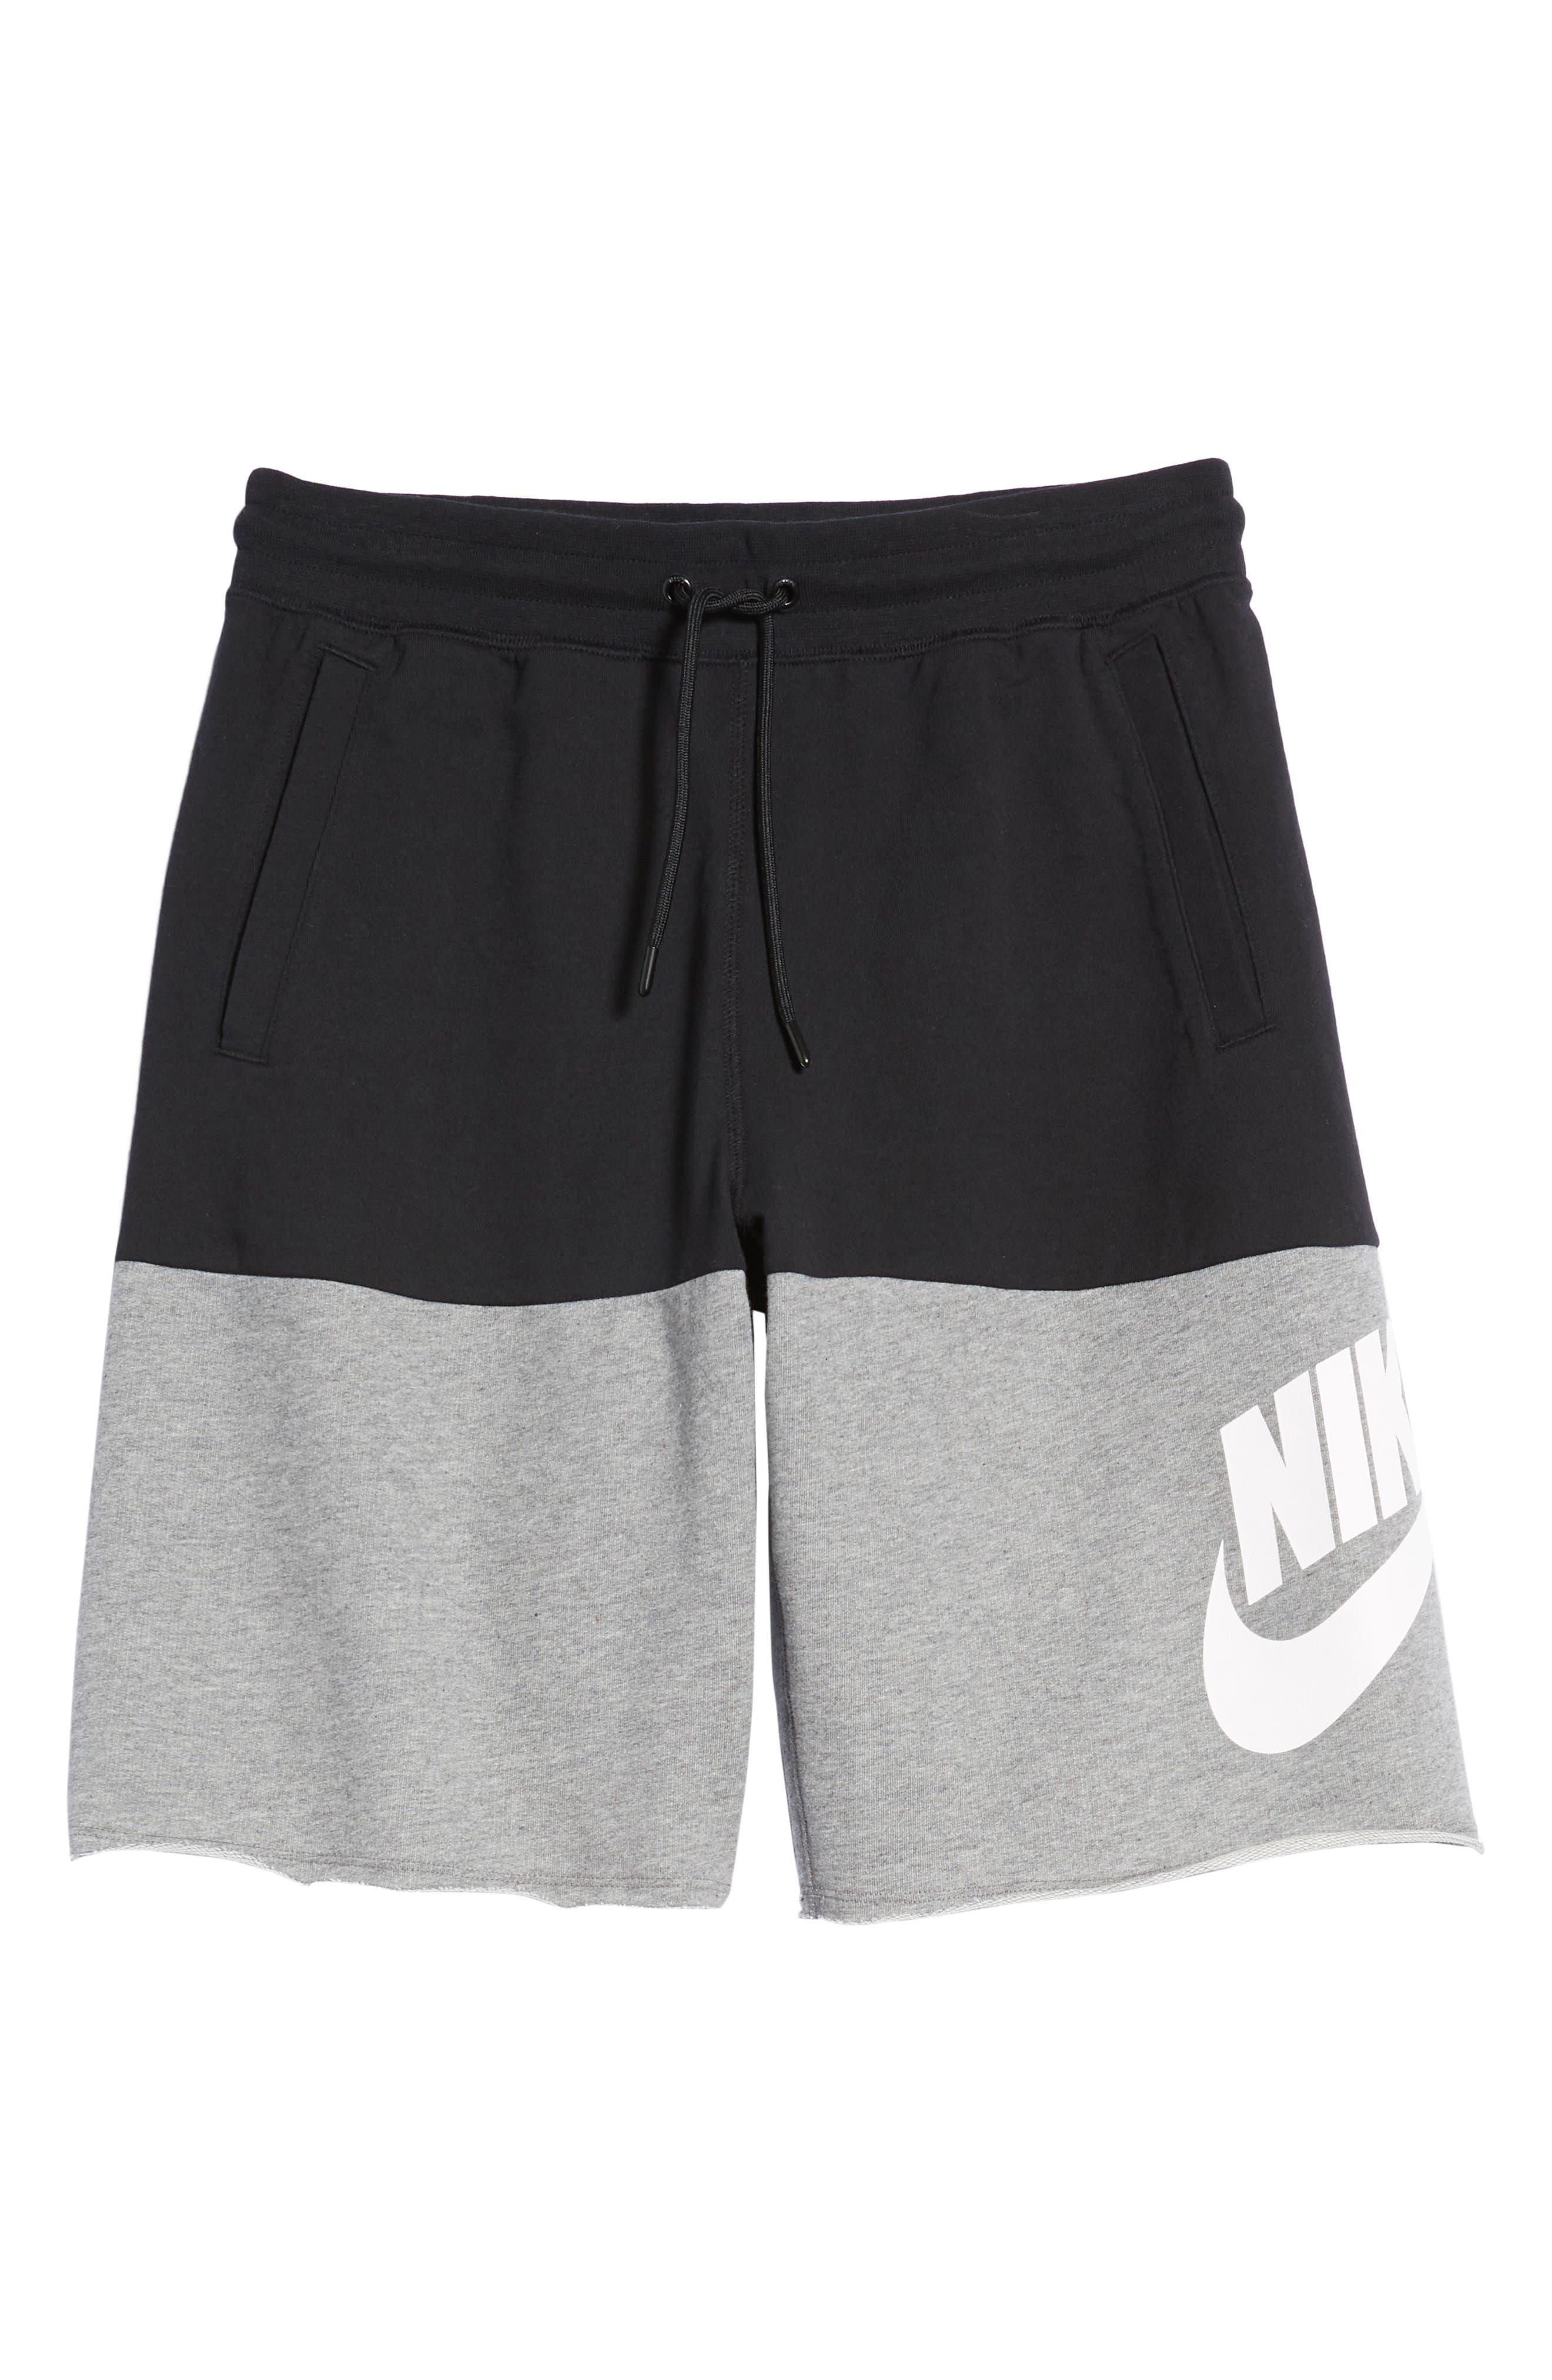 NSW Franchise GX3 Shorts,                             Alternate thumbnail 6, color,                             BLACK/ CARBON HEATHER/ WHITE